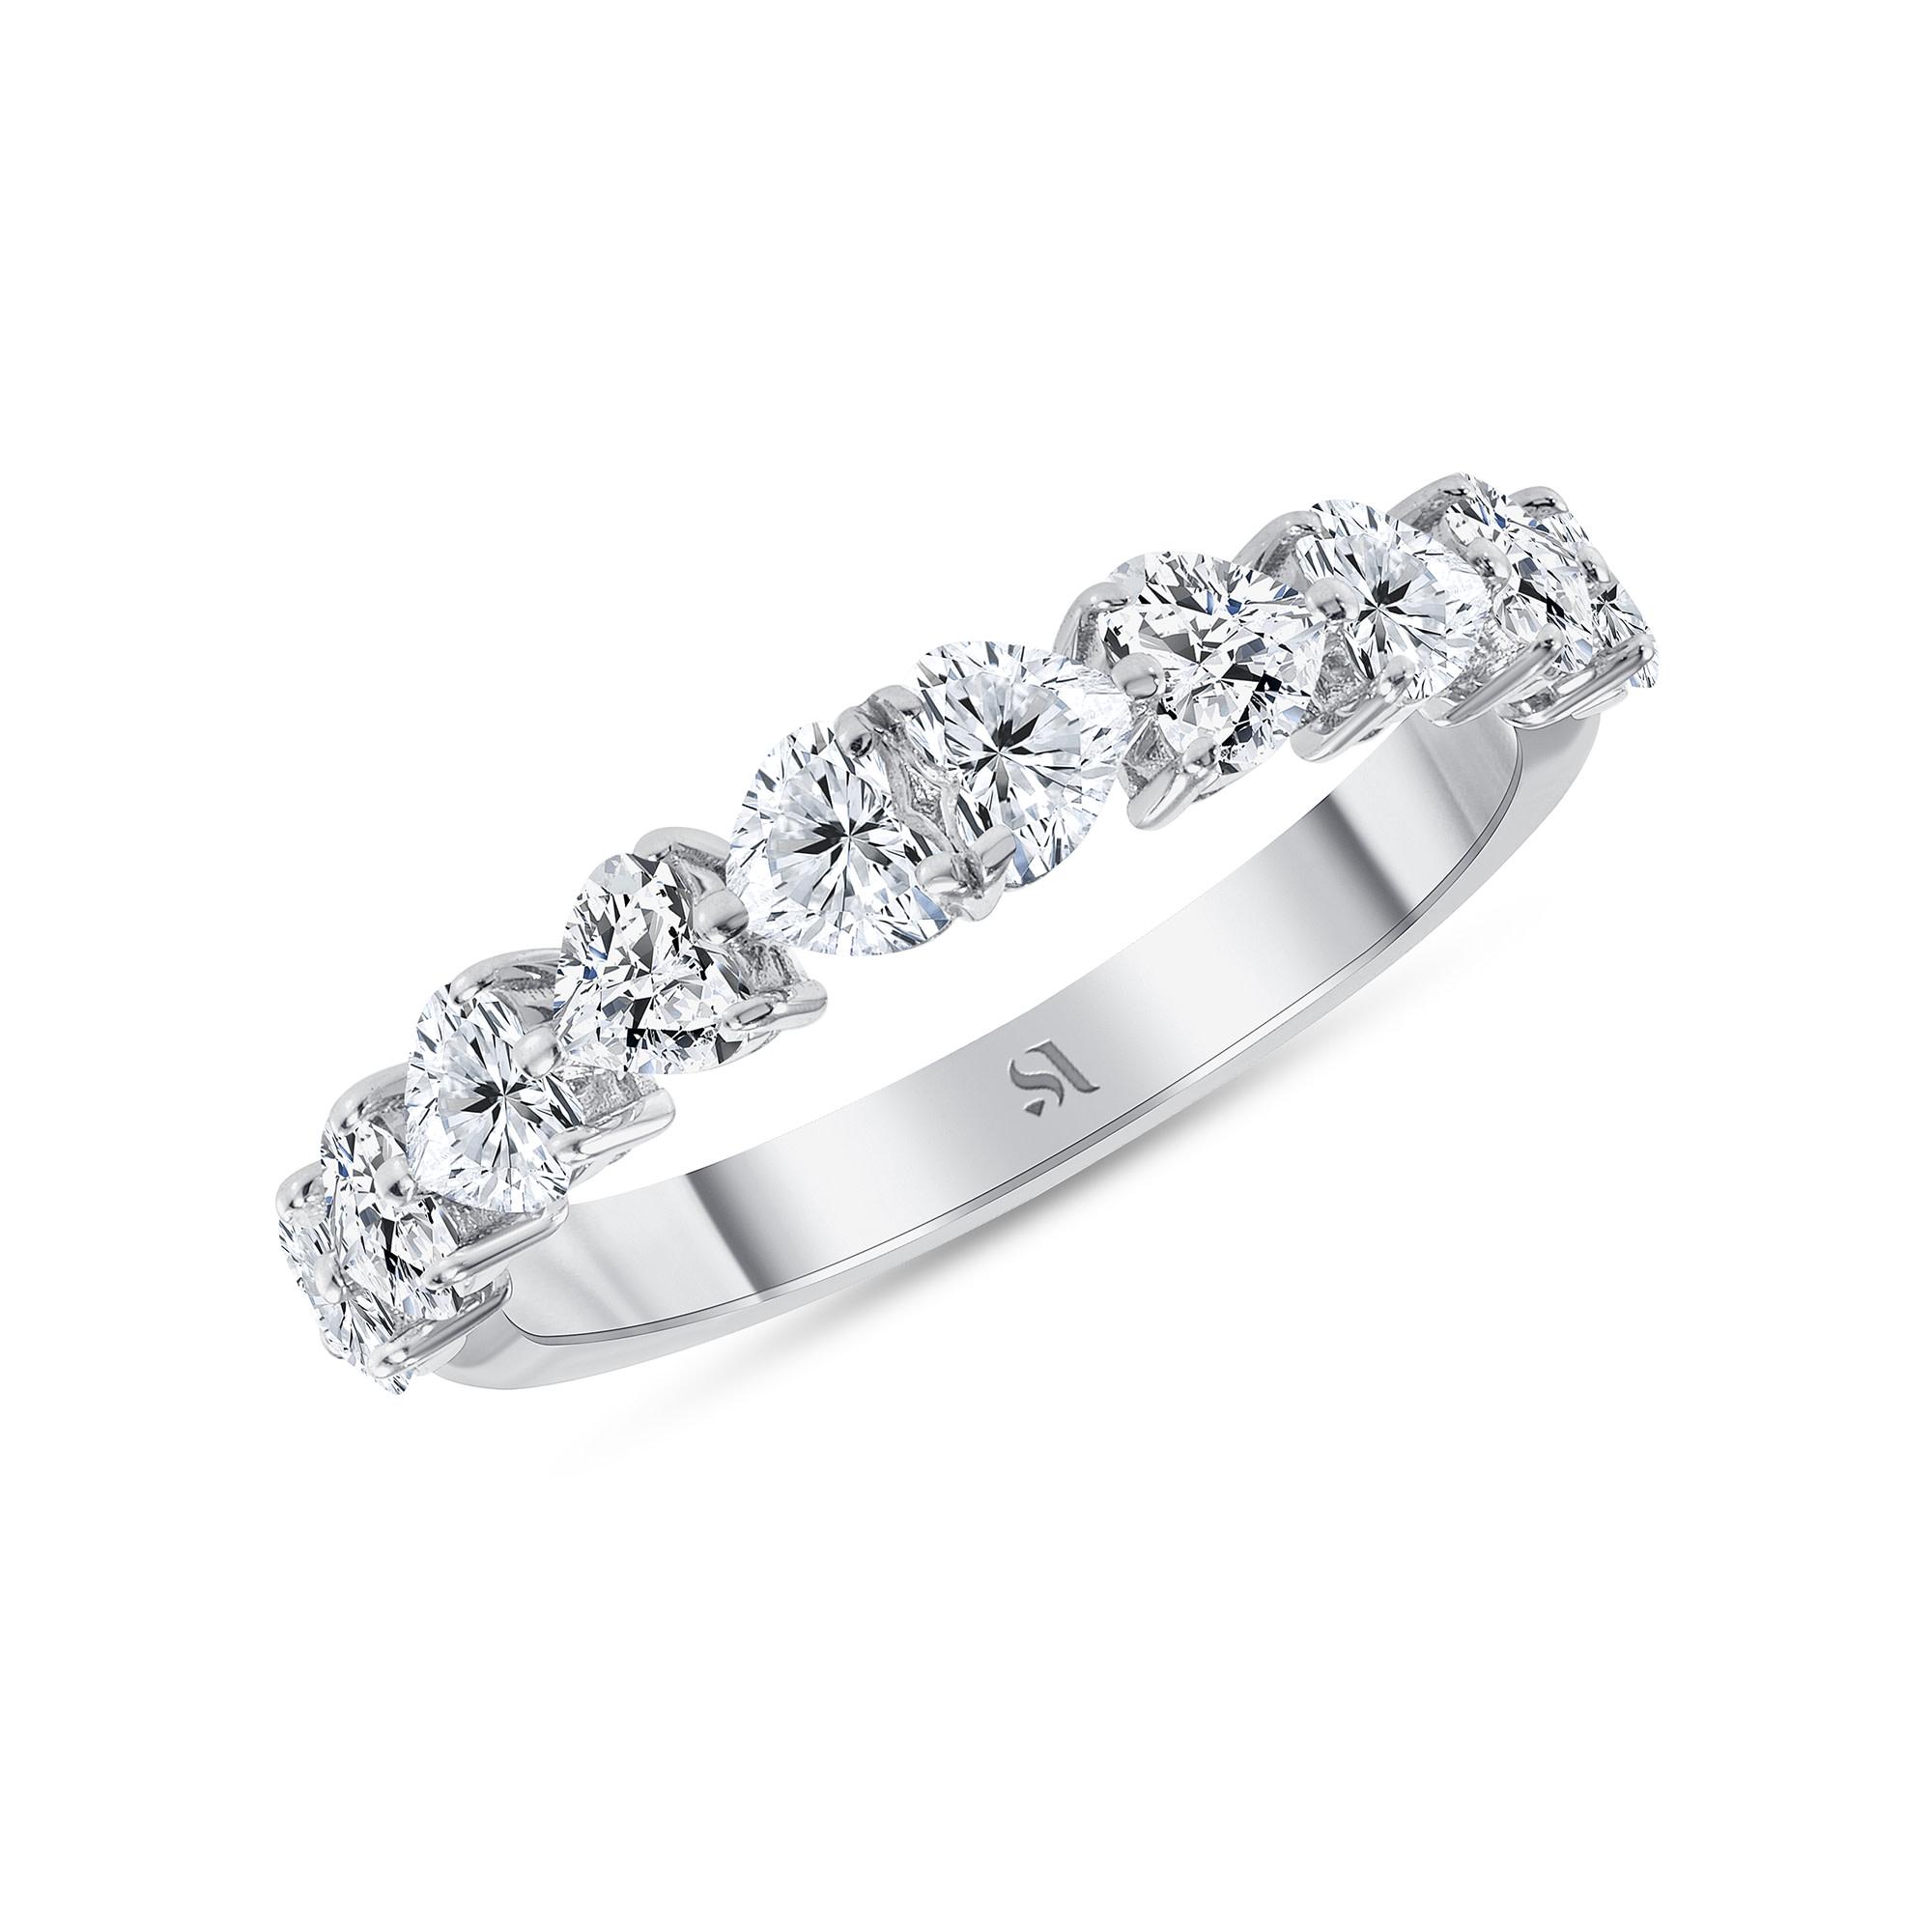 Half heart shaped diamond ring white gold